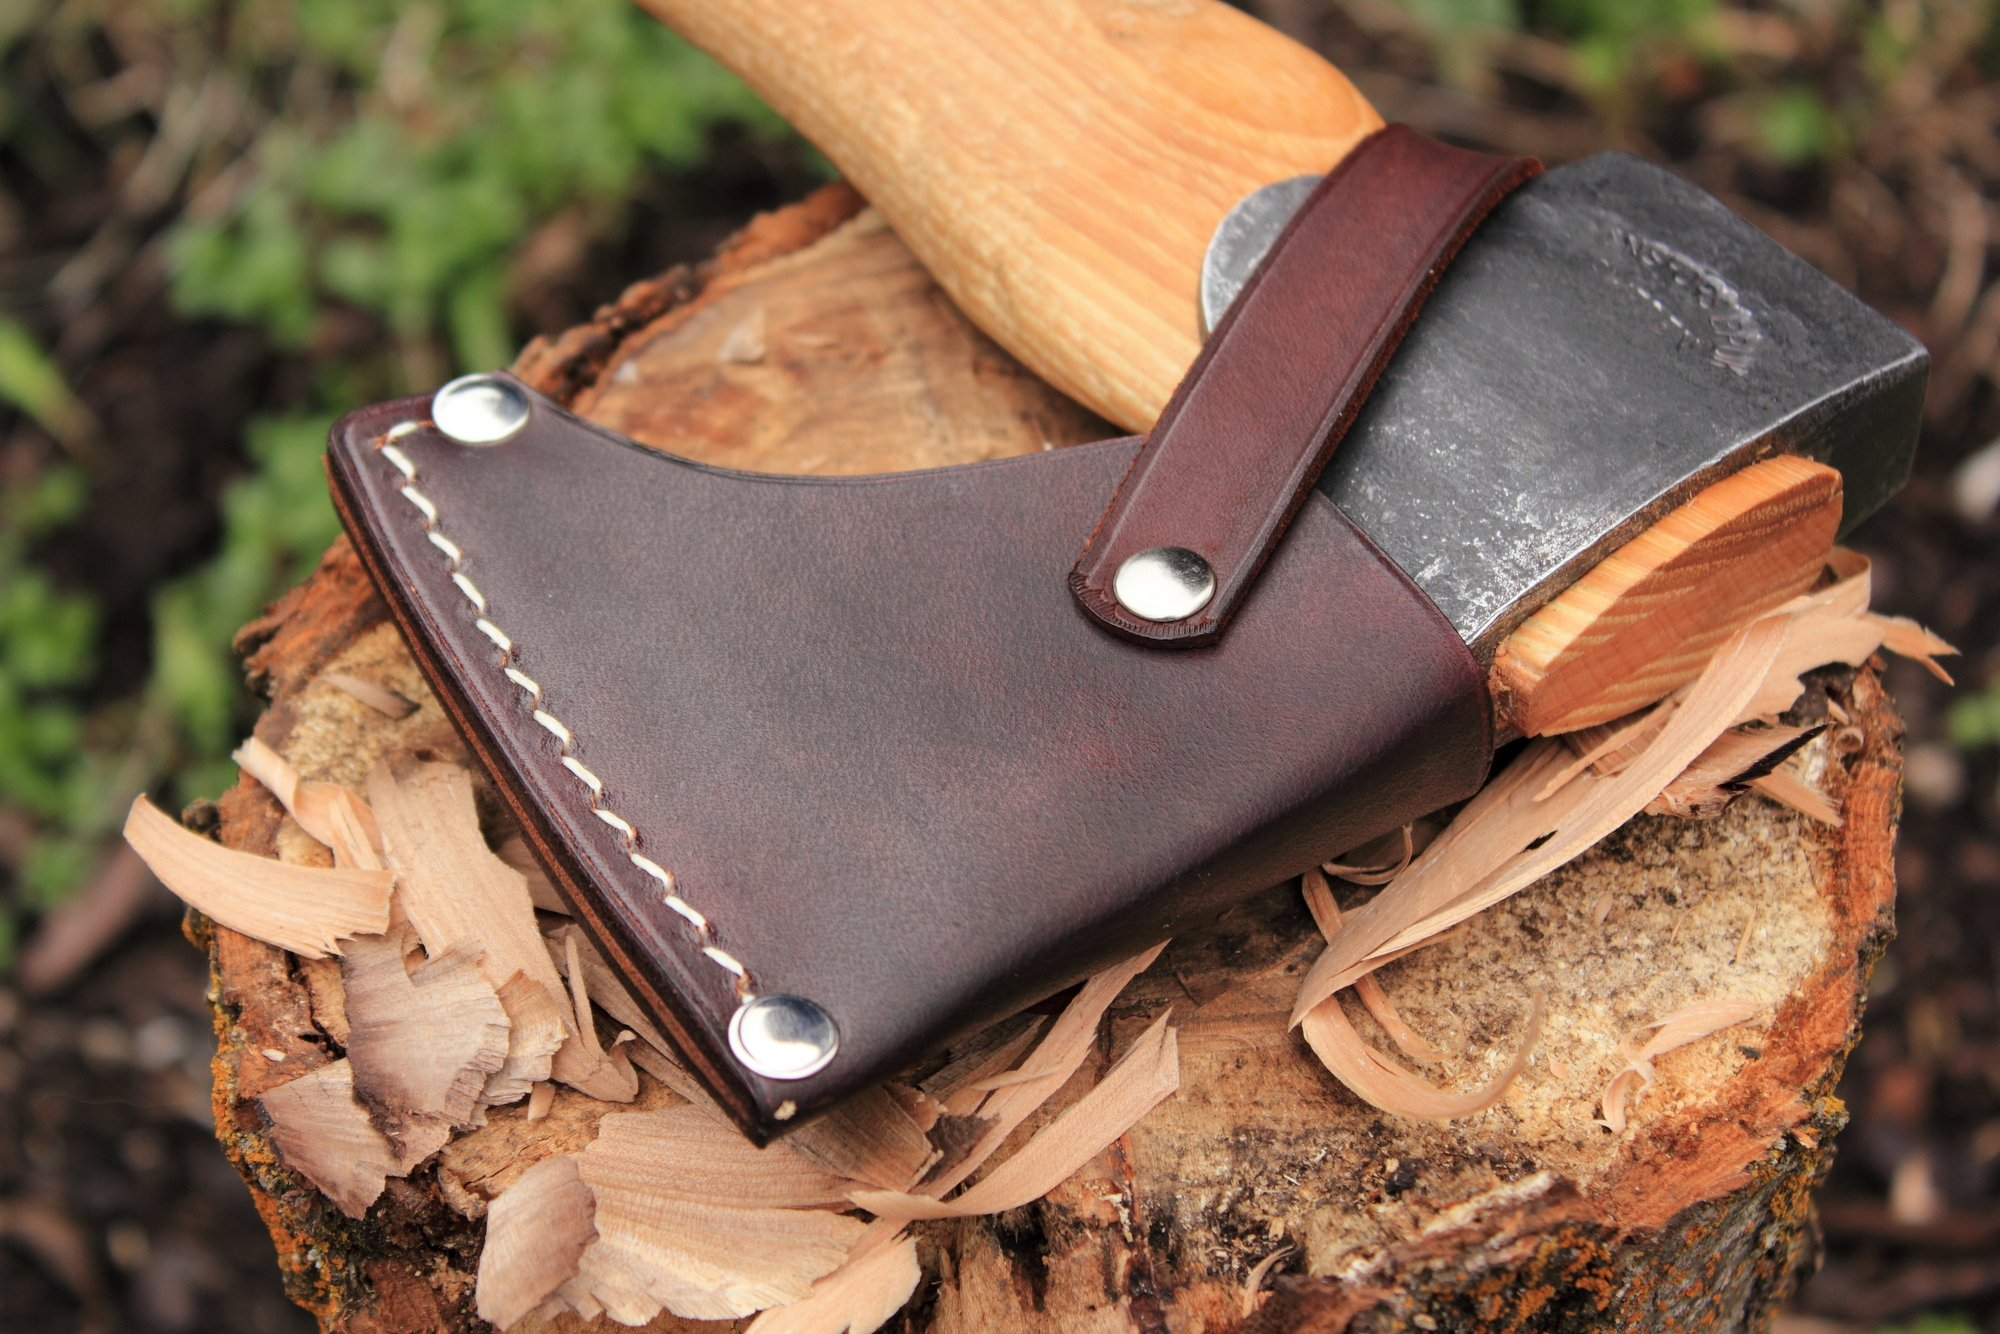 Axe Sheath for Gransfors Bruks Hand Hatchet (and G B  Large Carving  Hatchet, Carved Handle)